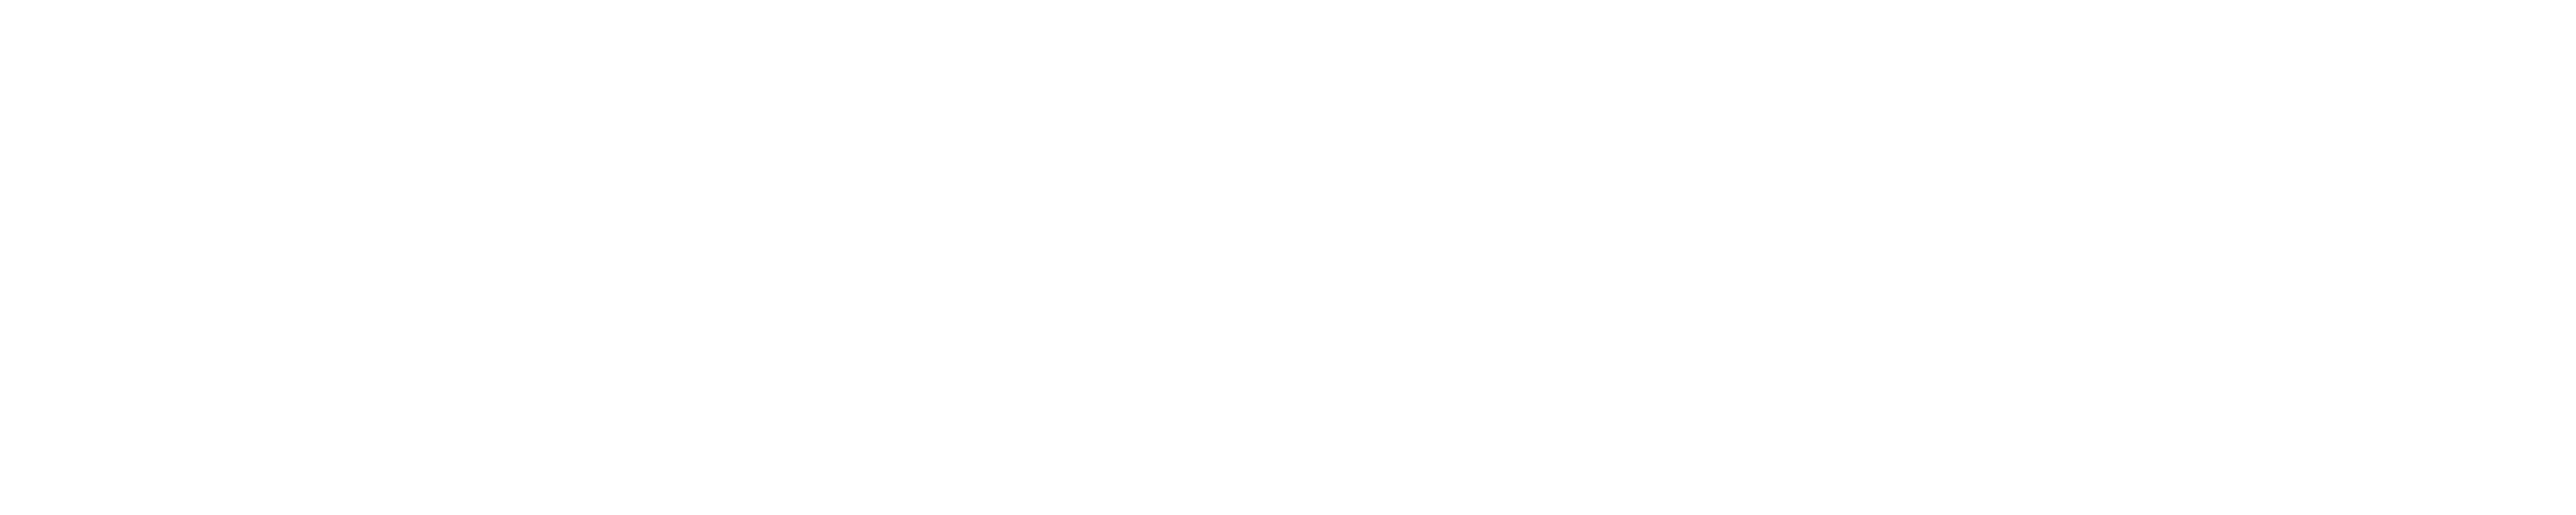 Video10x Logo White